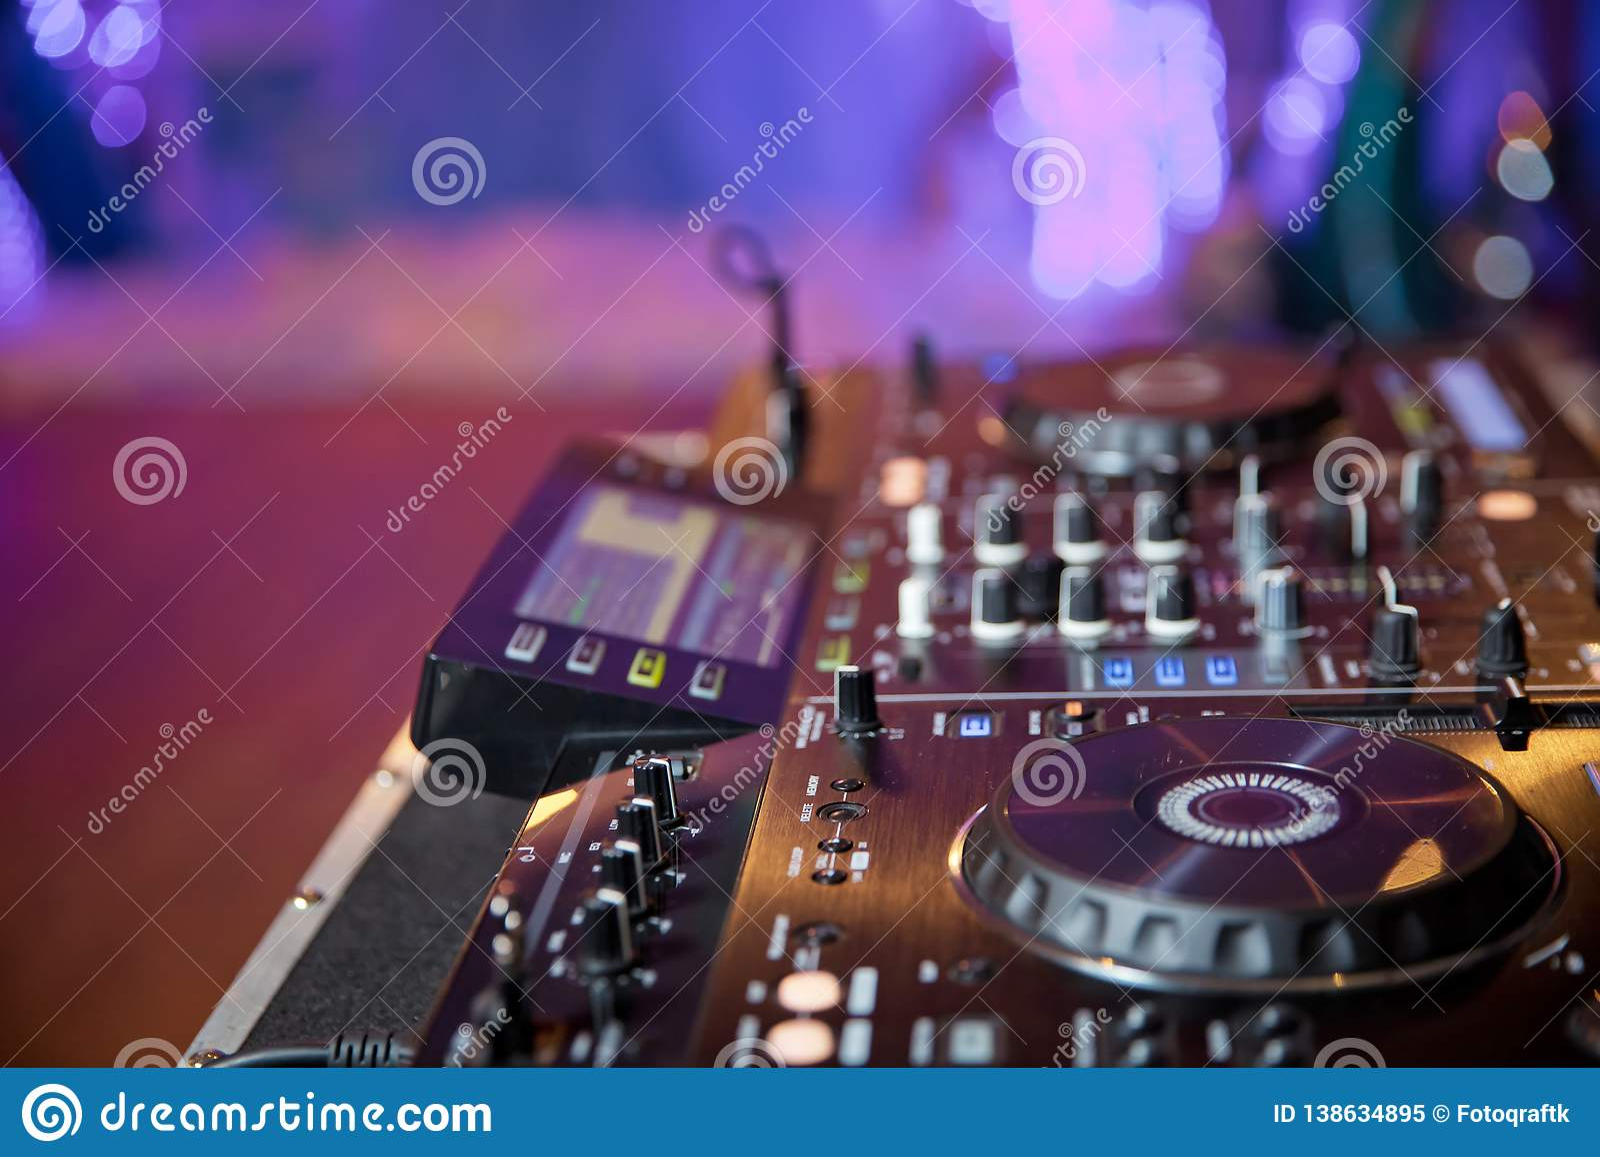 Disc Jockey Mix Music On Digital Midi Turntable Controller